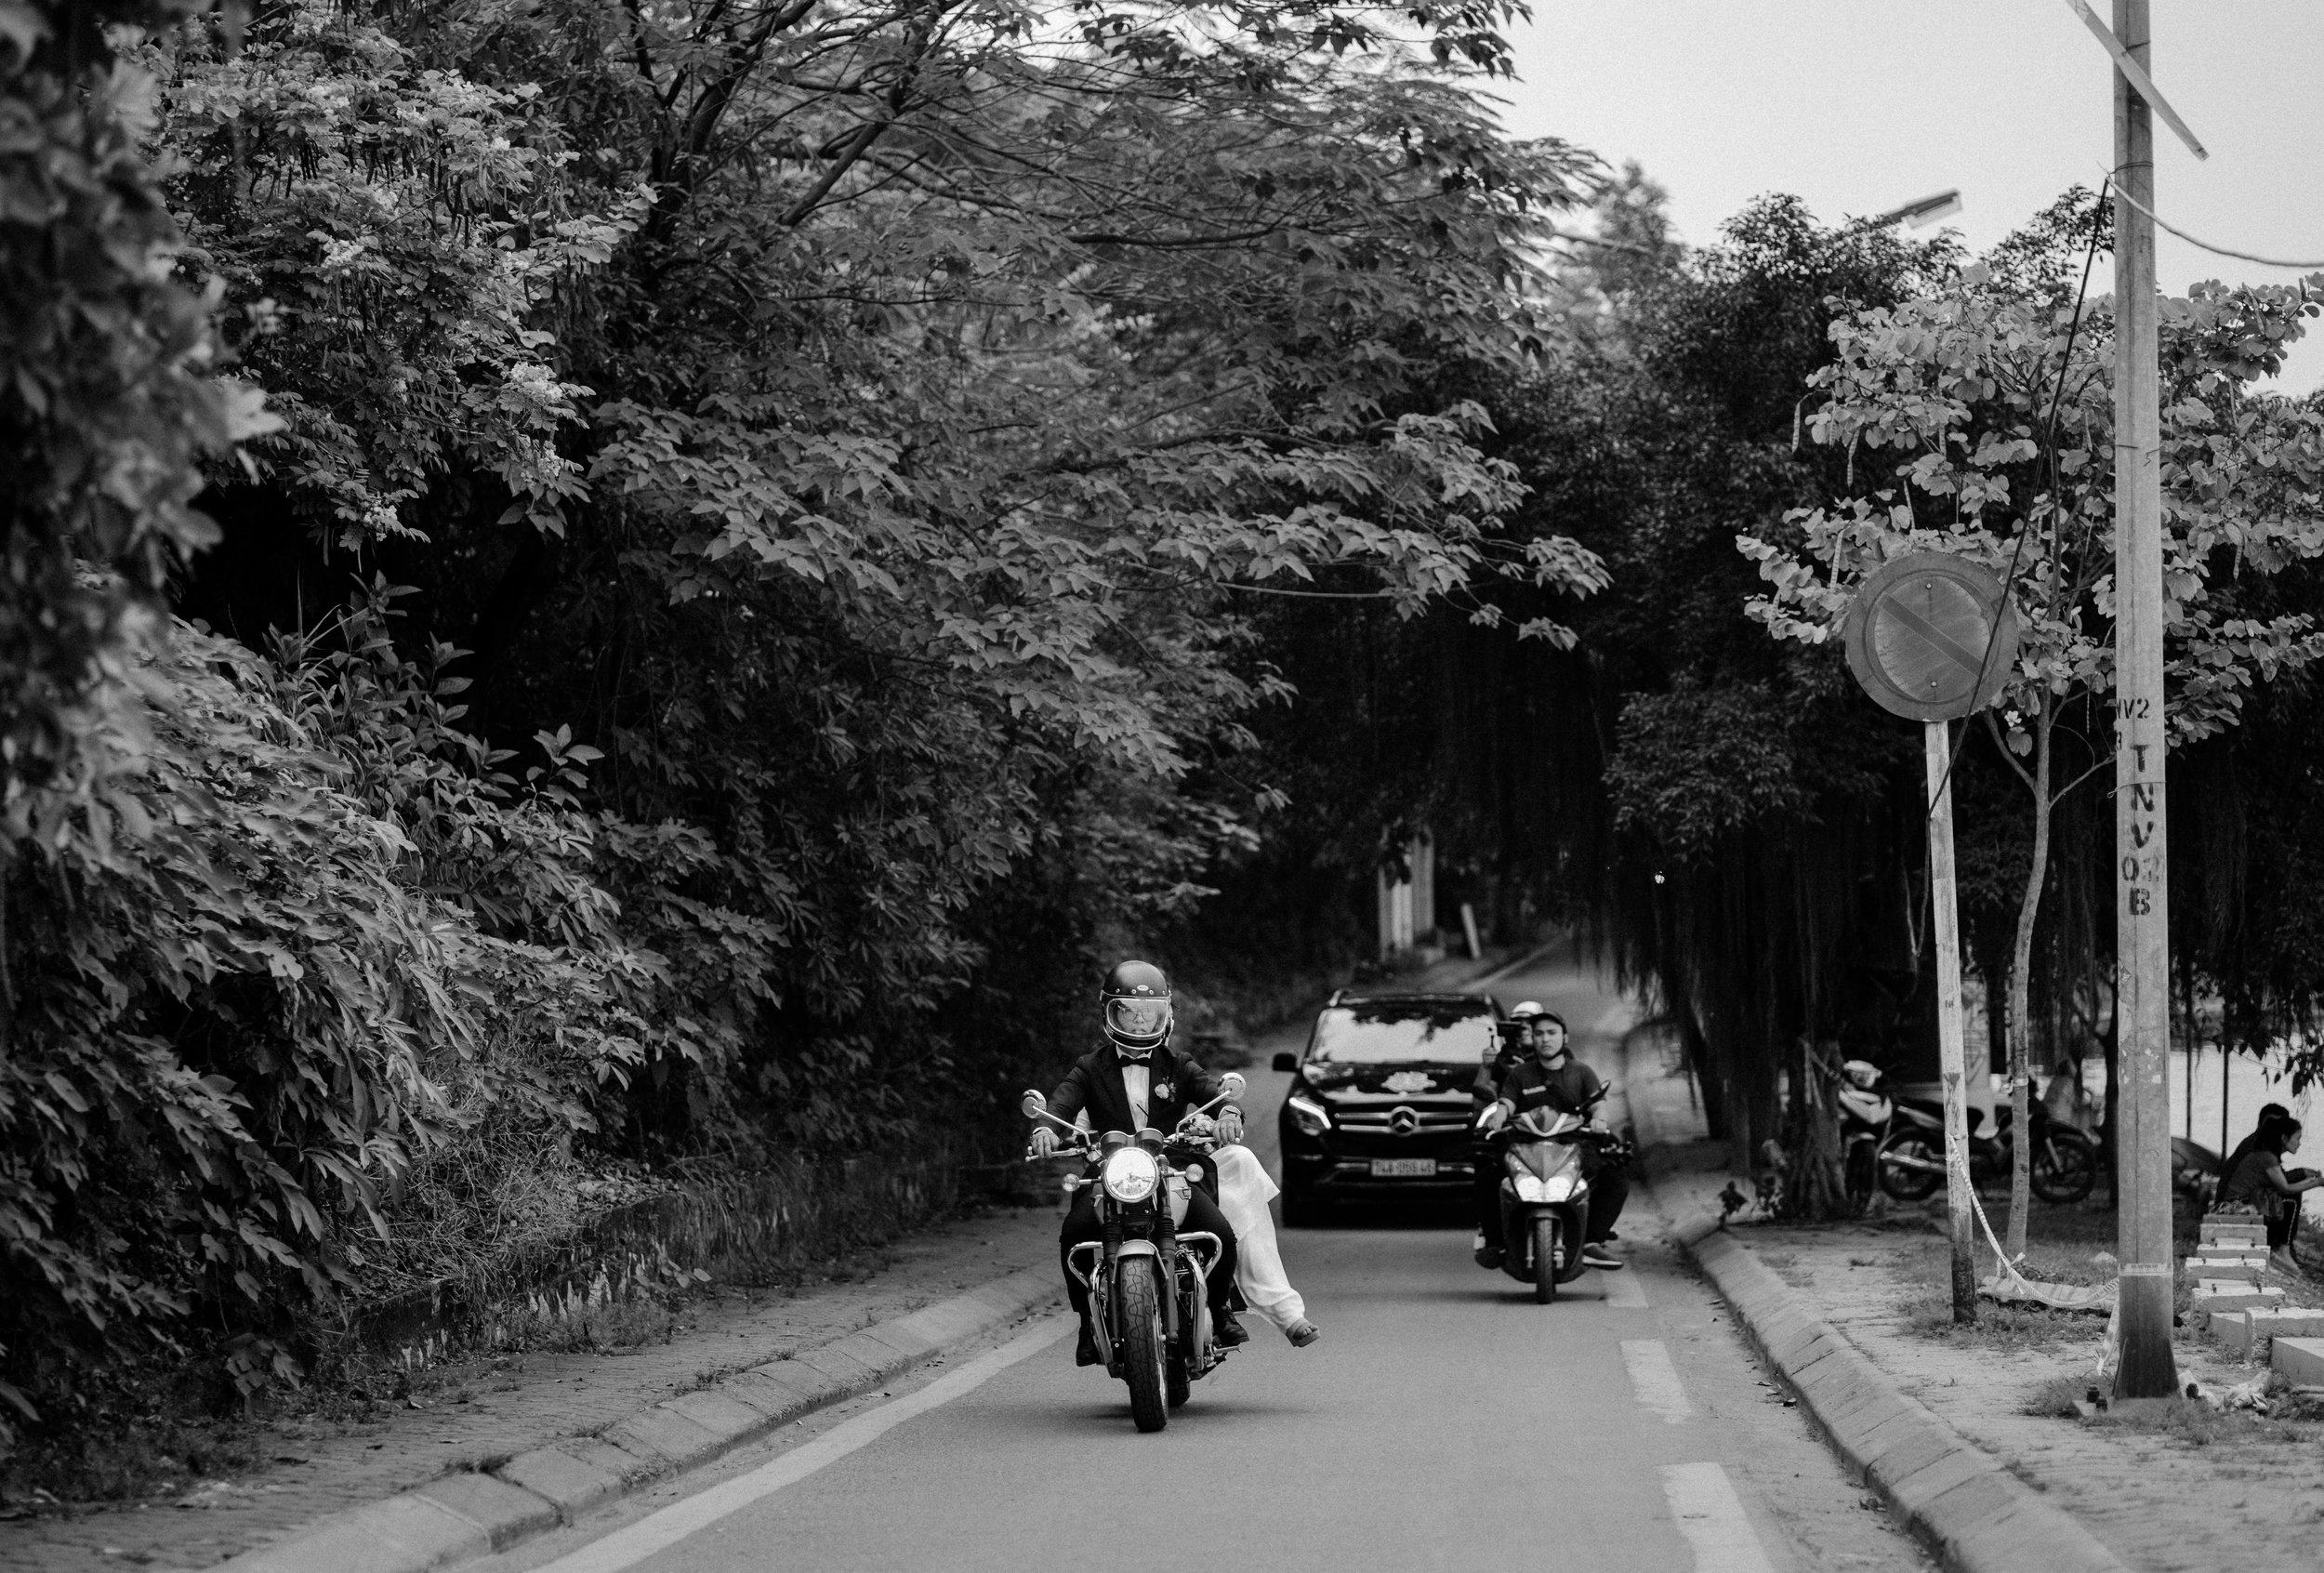 Mirrorwedding Destination Photographer TopofHanoi Duc Anh Hien Trang 095923.jpg